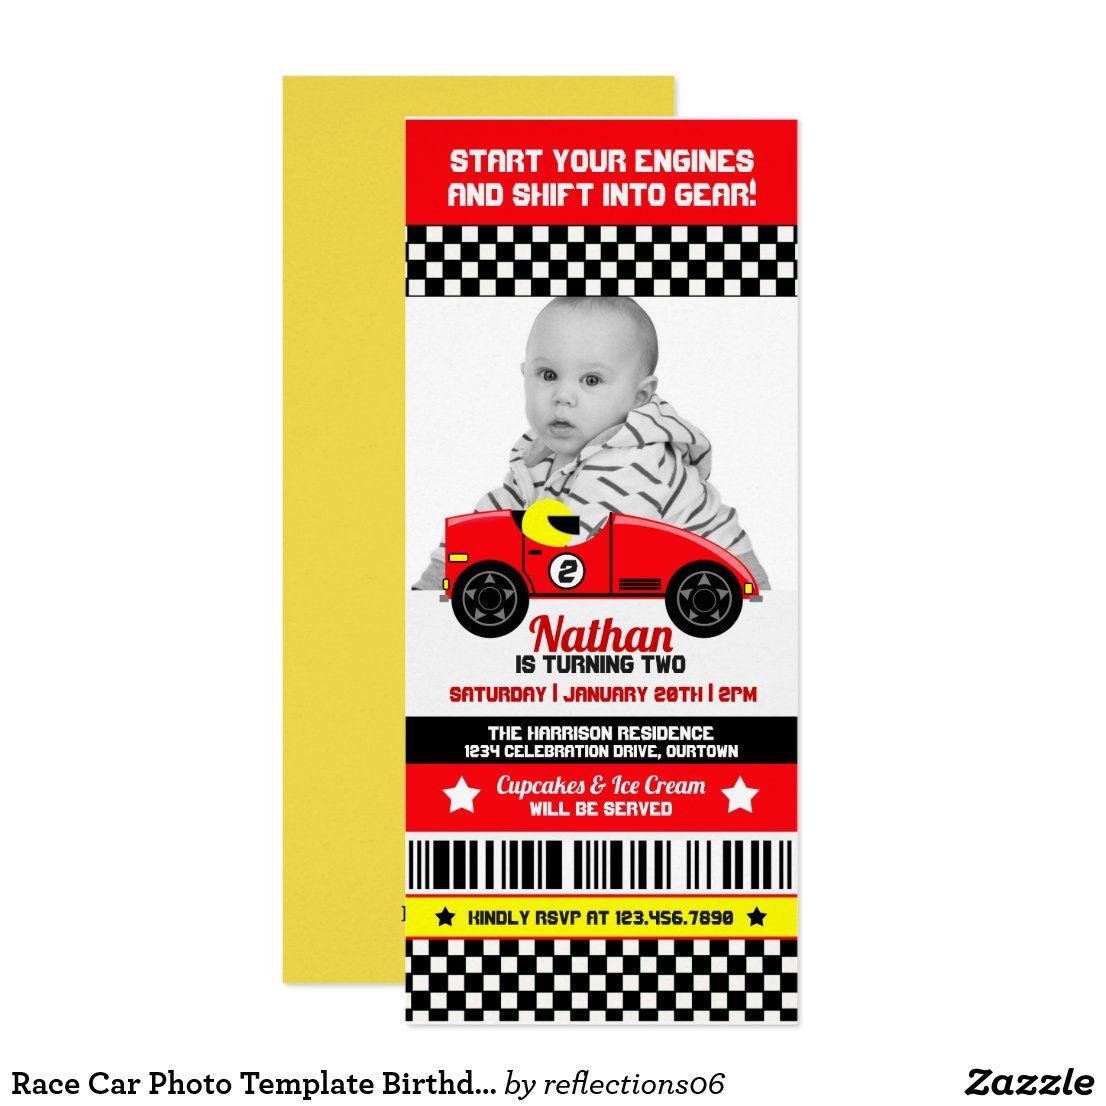 Race Car Photo Template Birthday Party Invitation | Zazzle.com